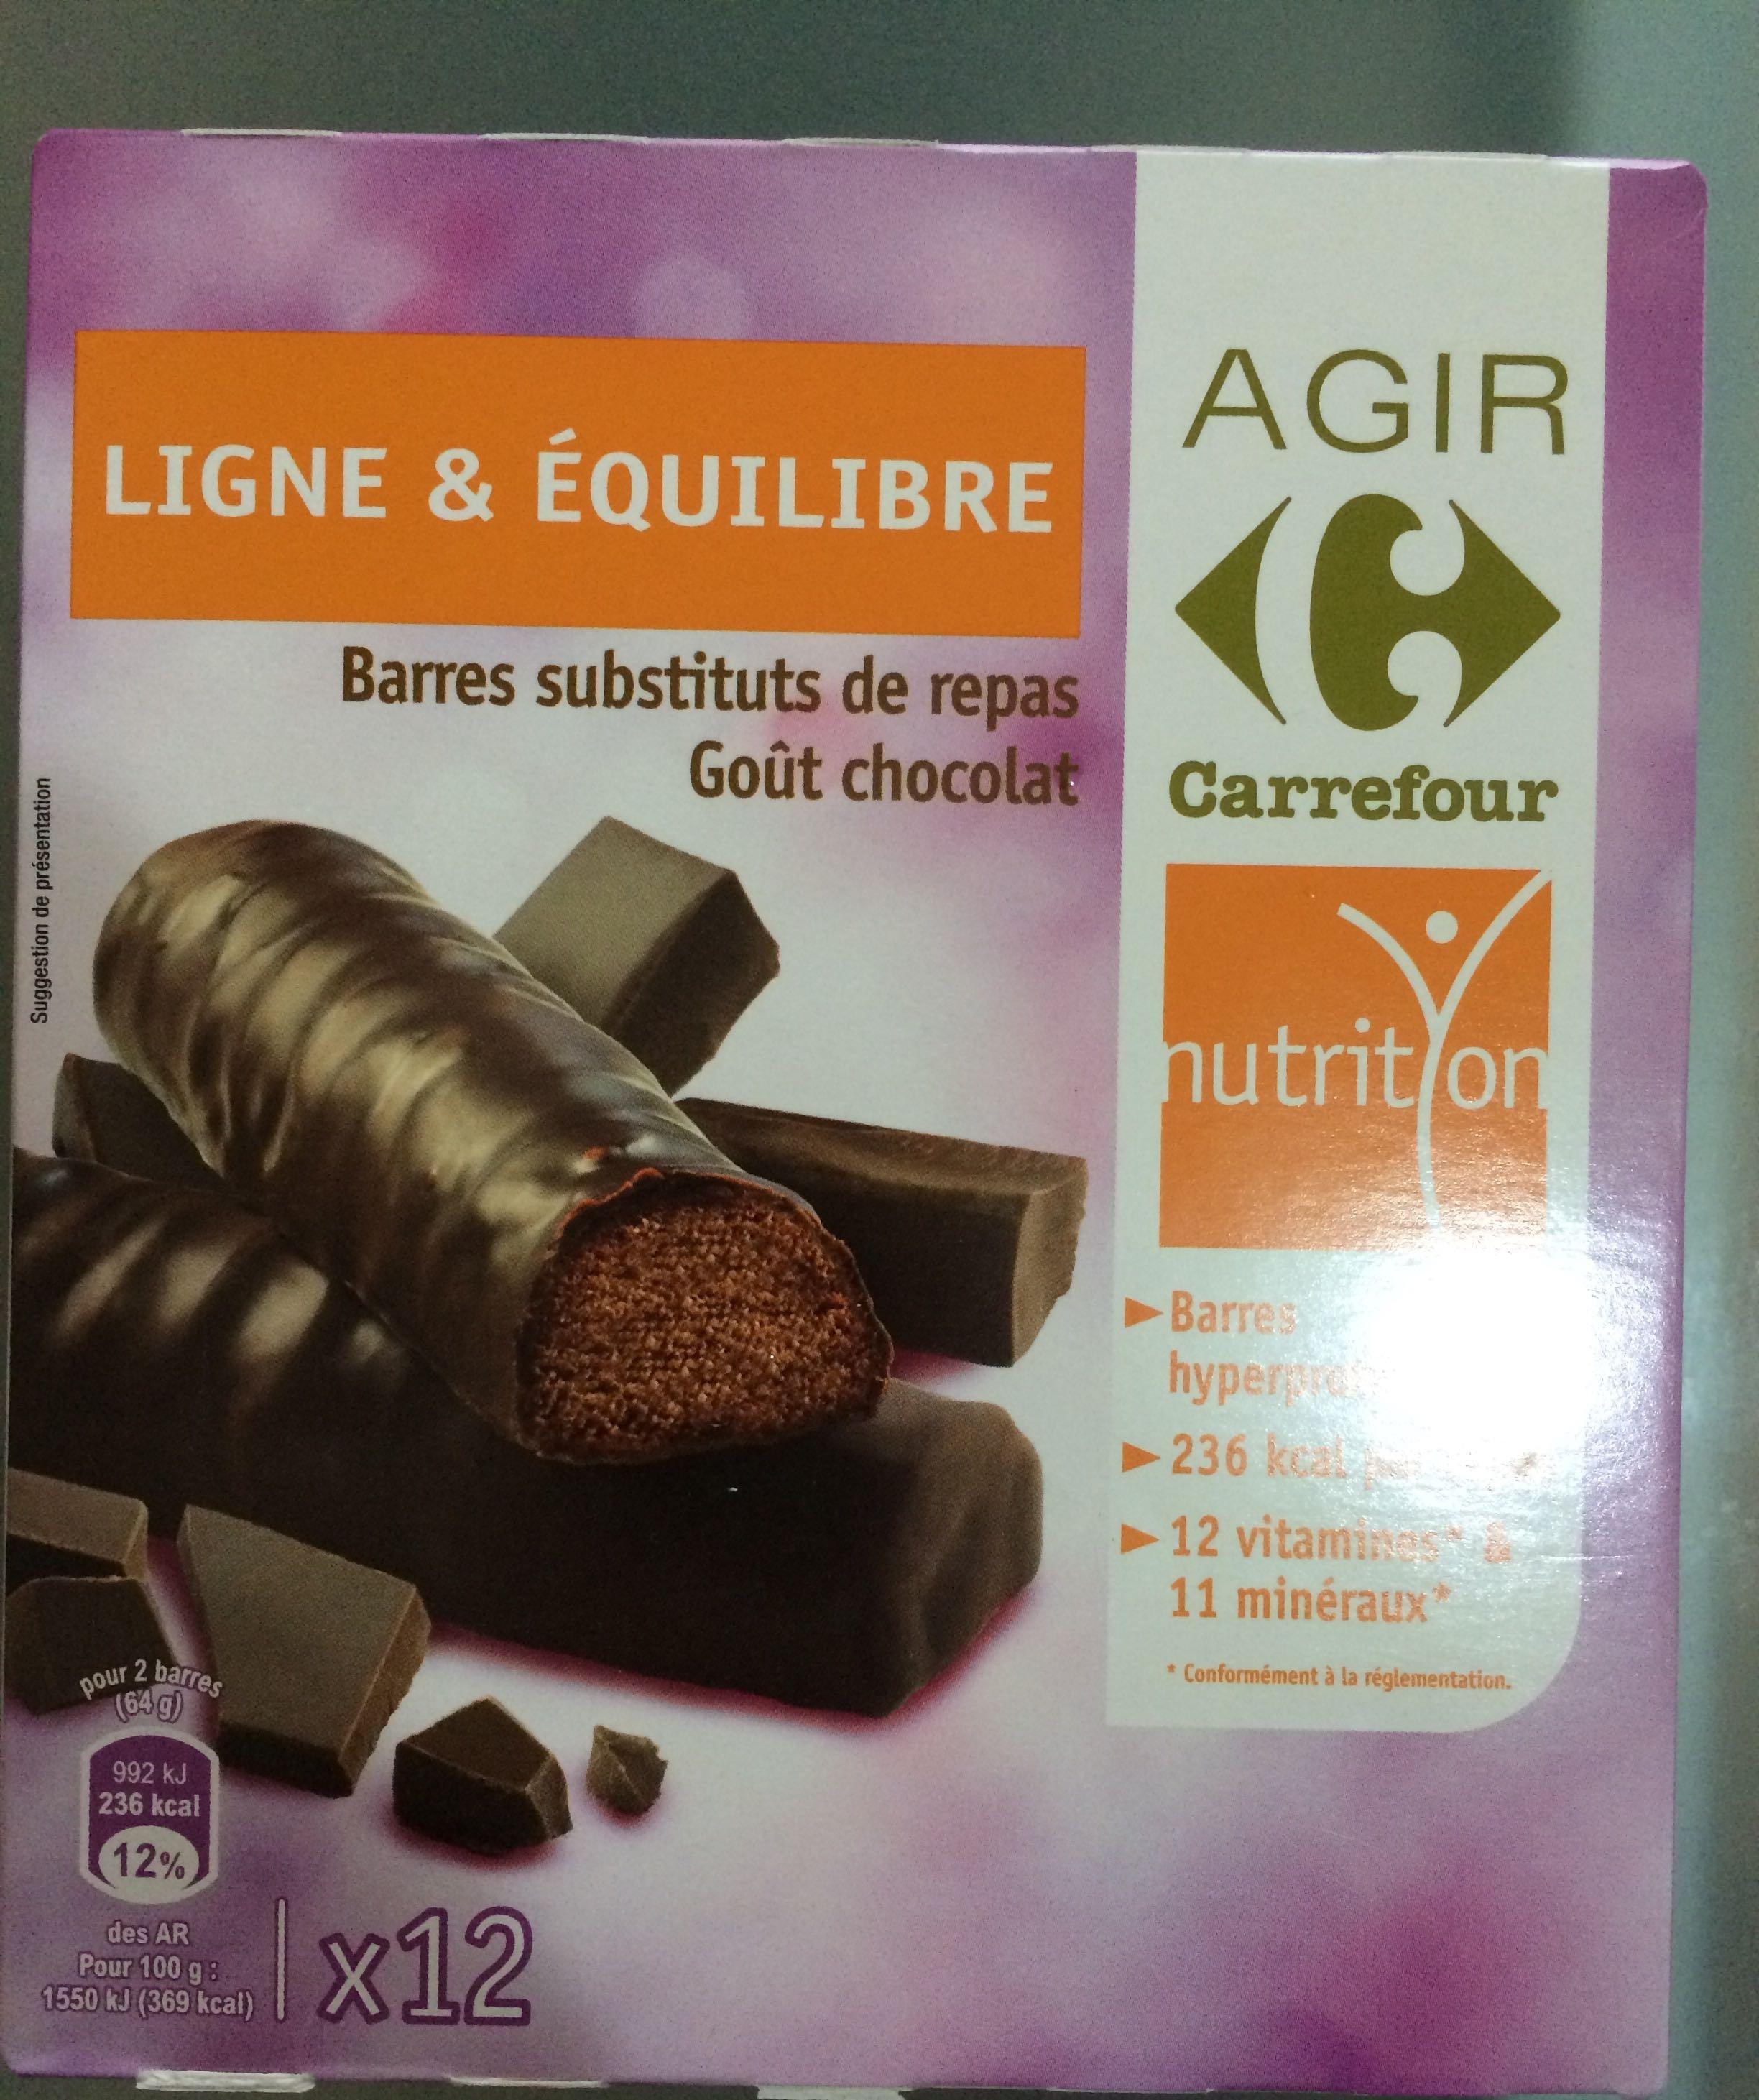 Barres substituts de repas Goût chocolat - Product